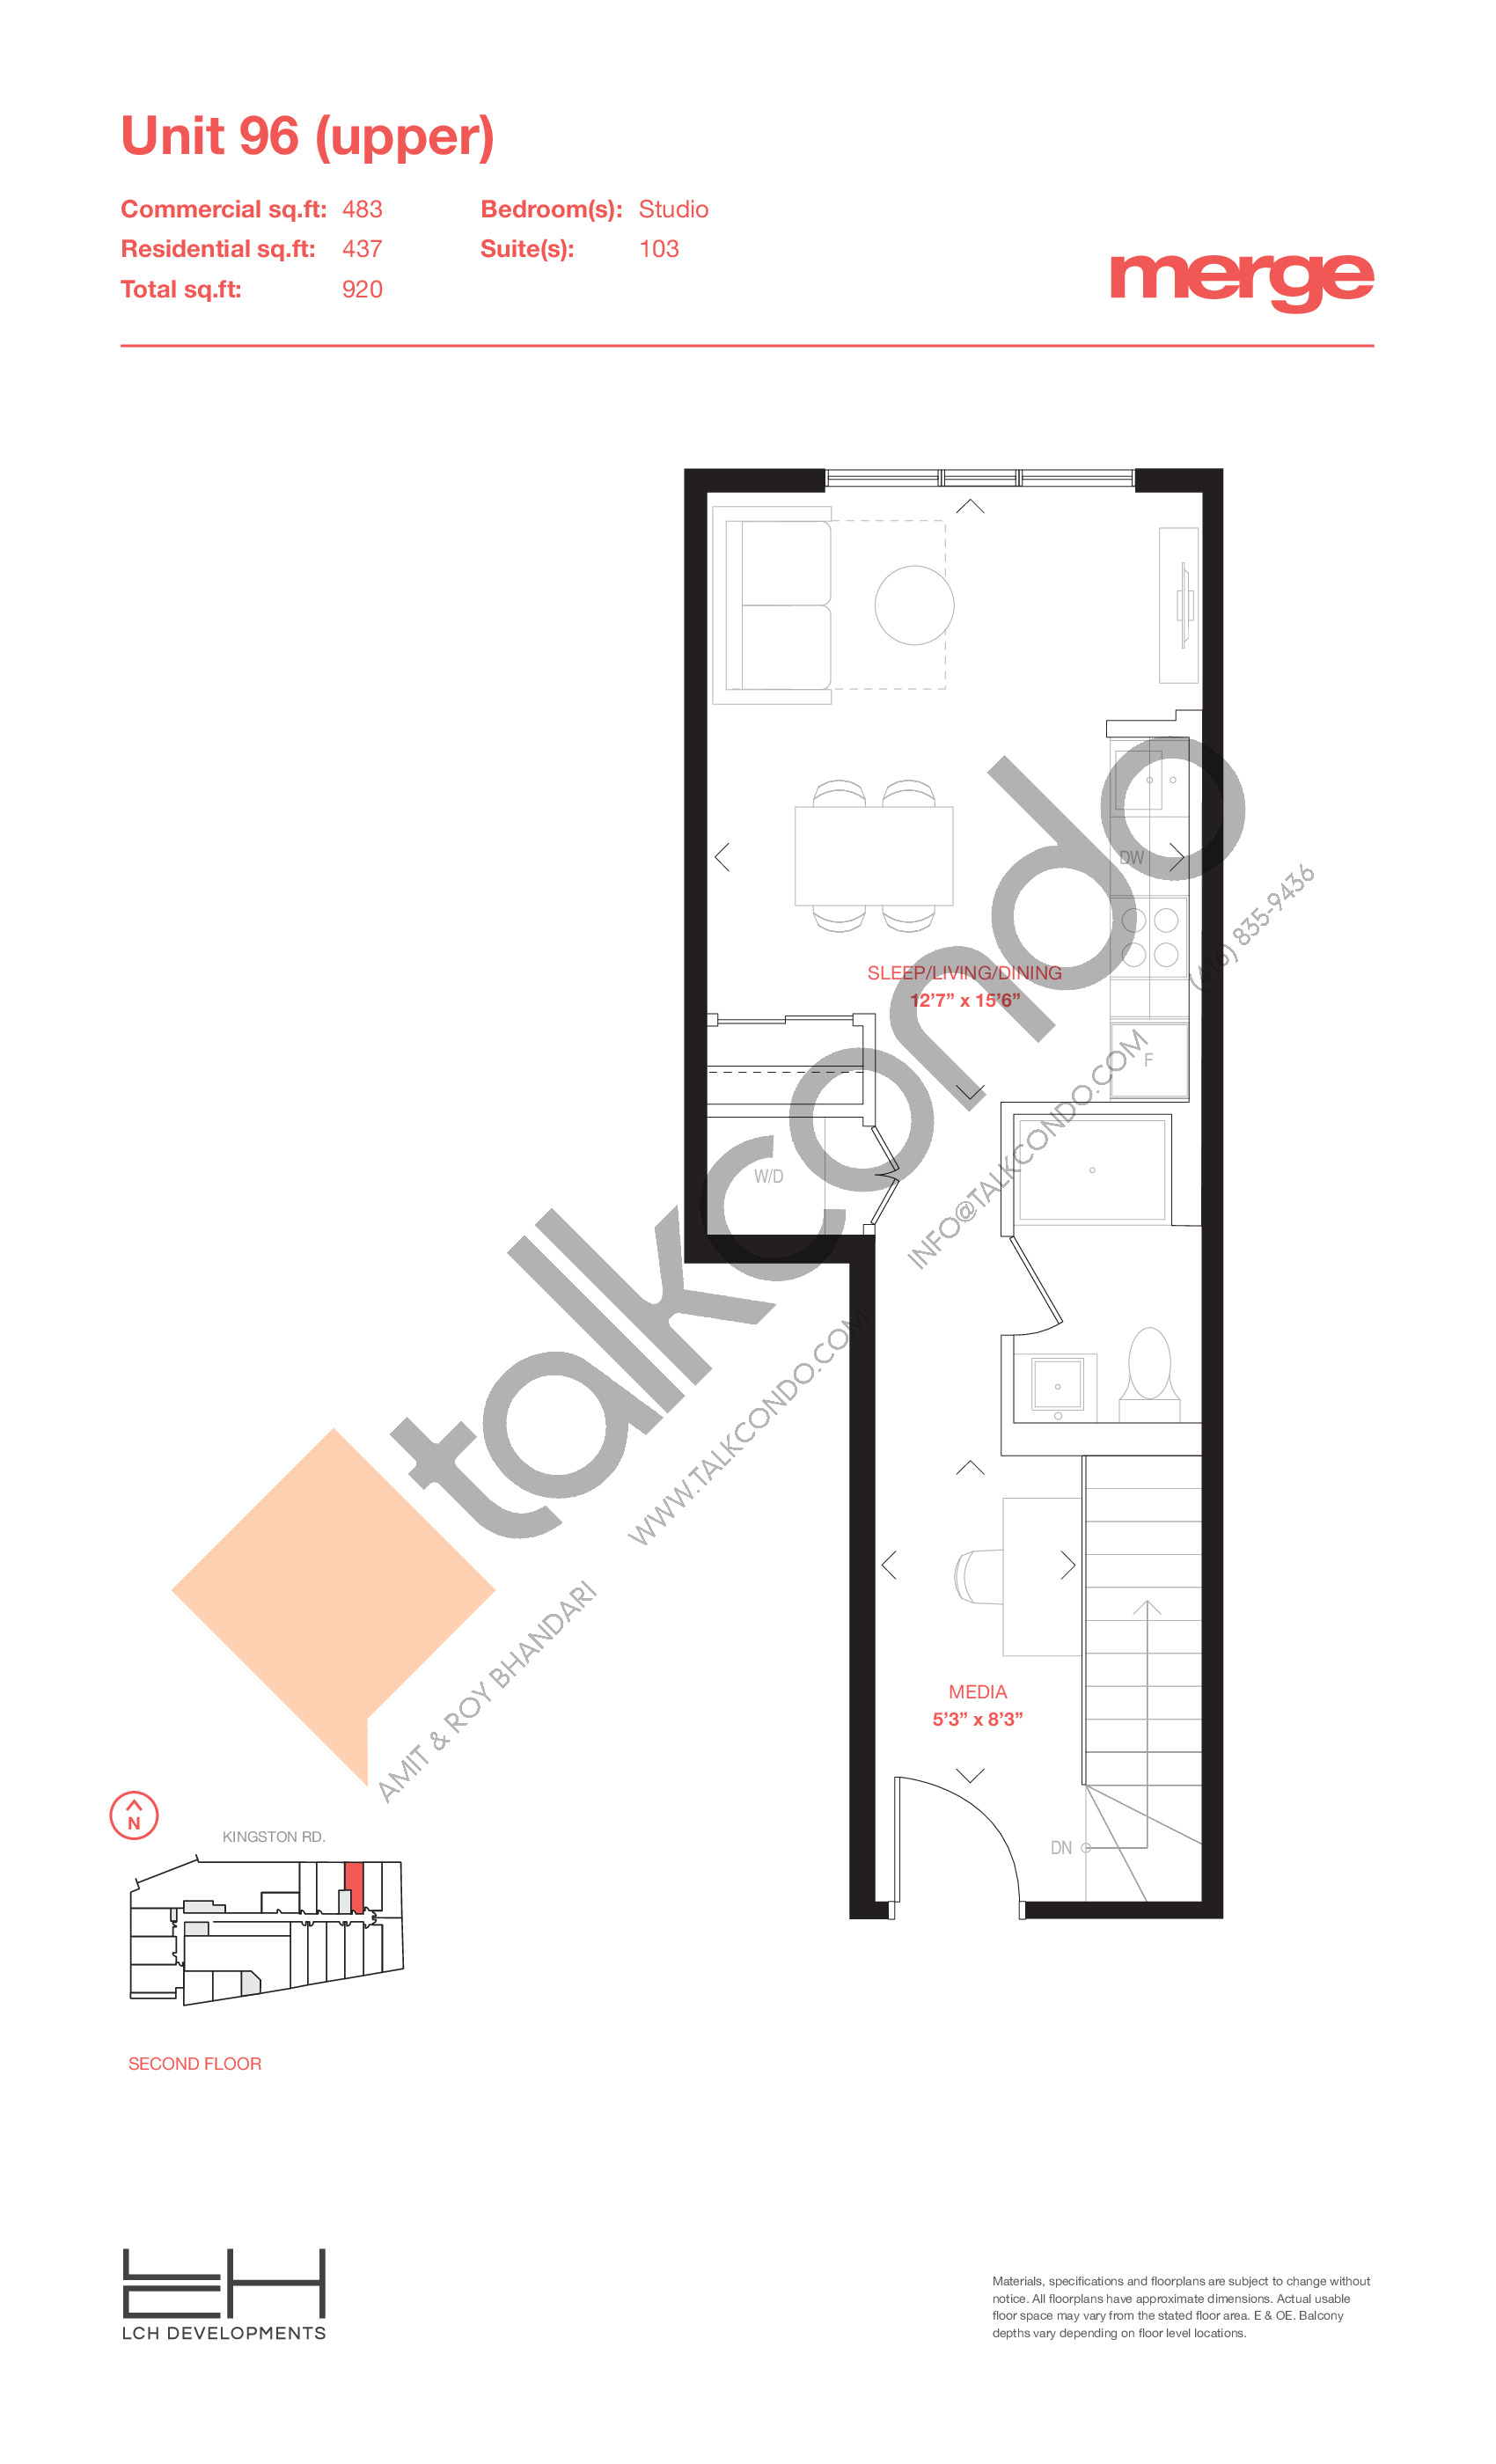 Unit 96 (Upper) - Livework Floor Plan at Merge Condos - 920 sq.ft